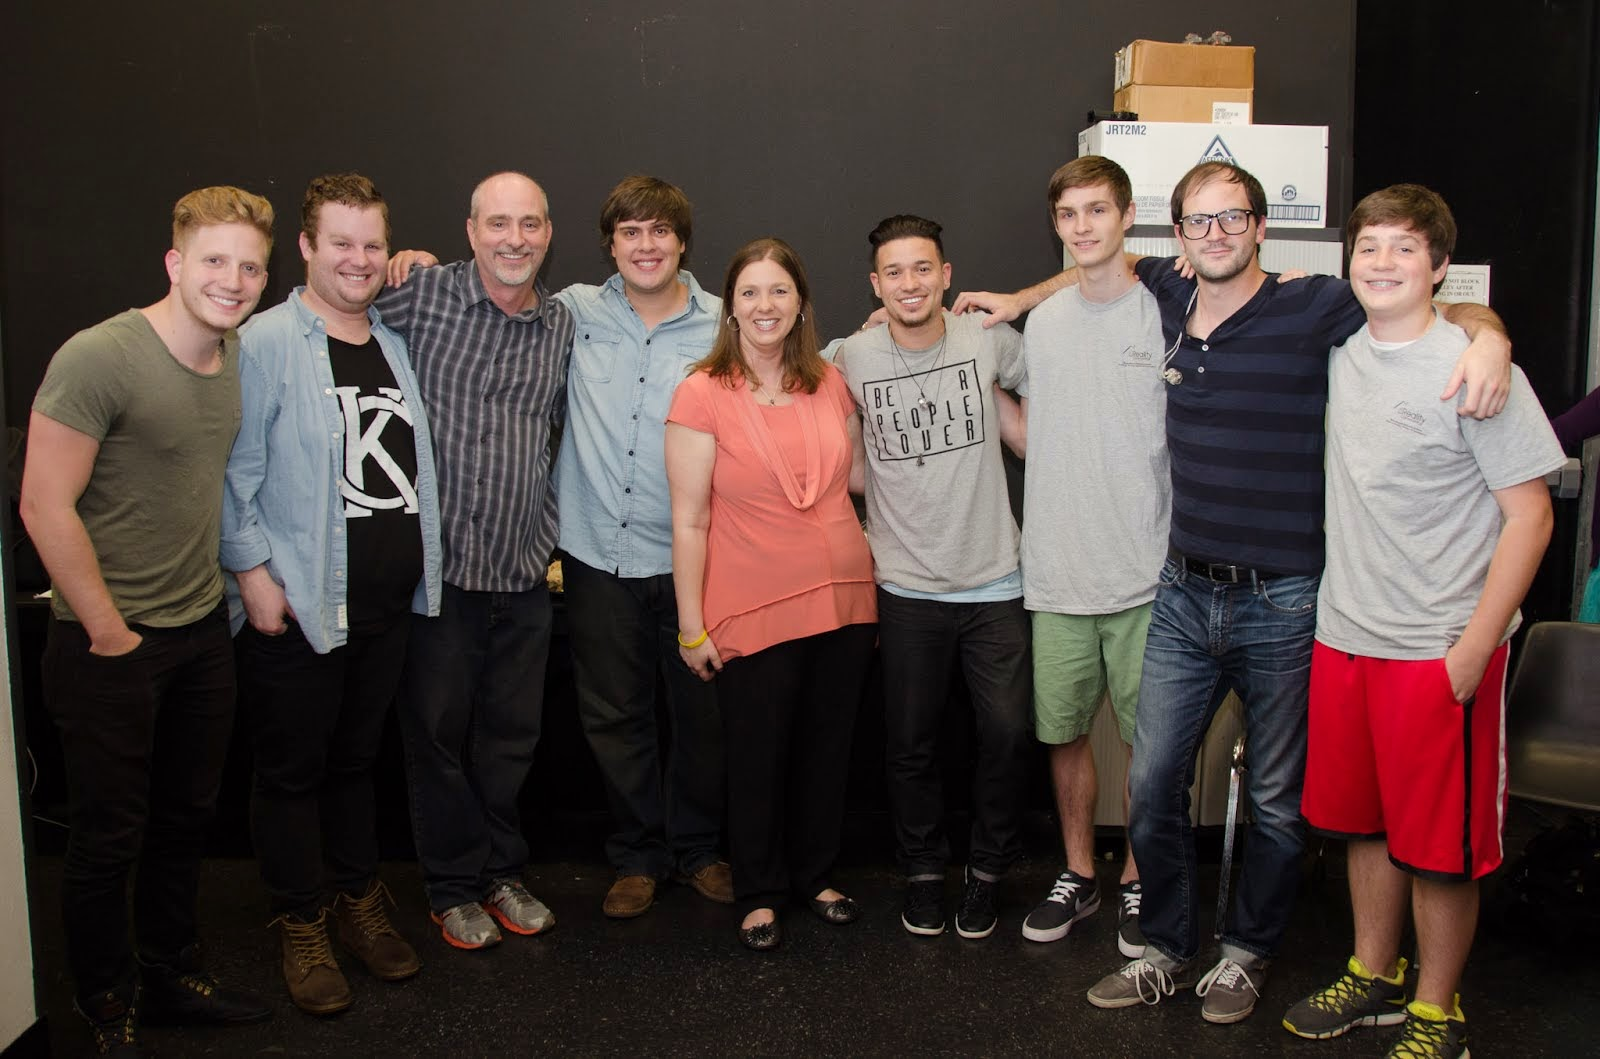 The Pounds Family w/ Matt Gilman & Band (August, 2014)